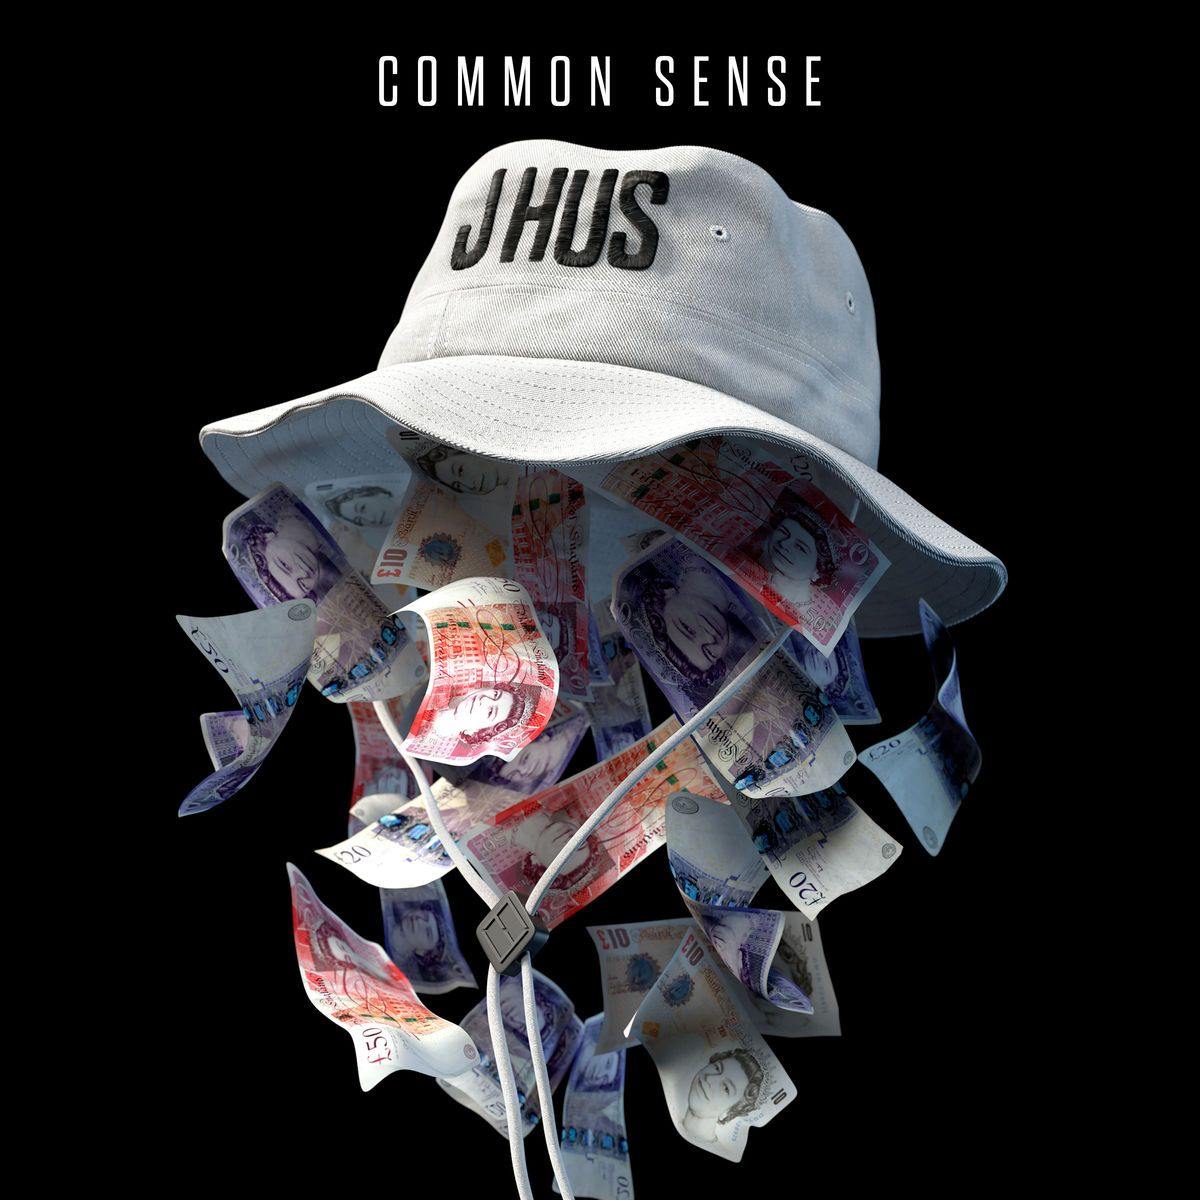 J Hus - Common Sense album cover